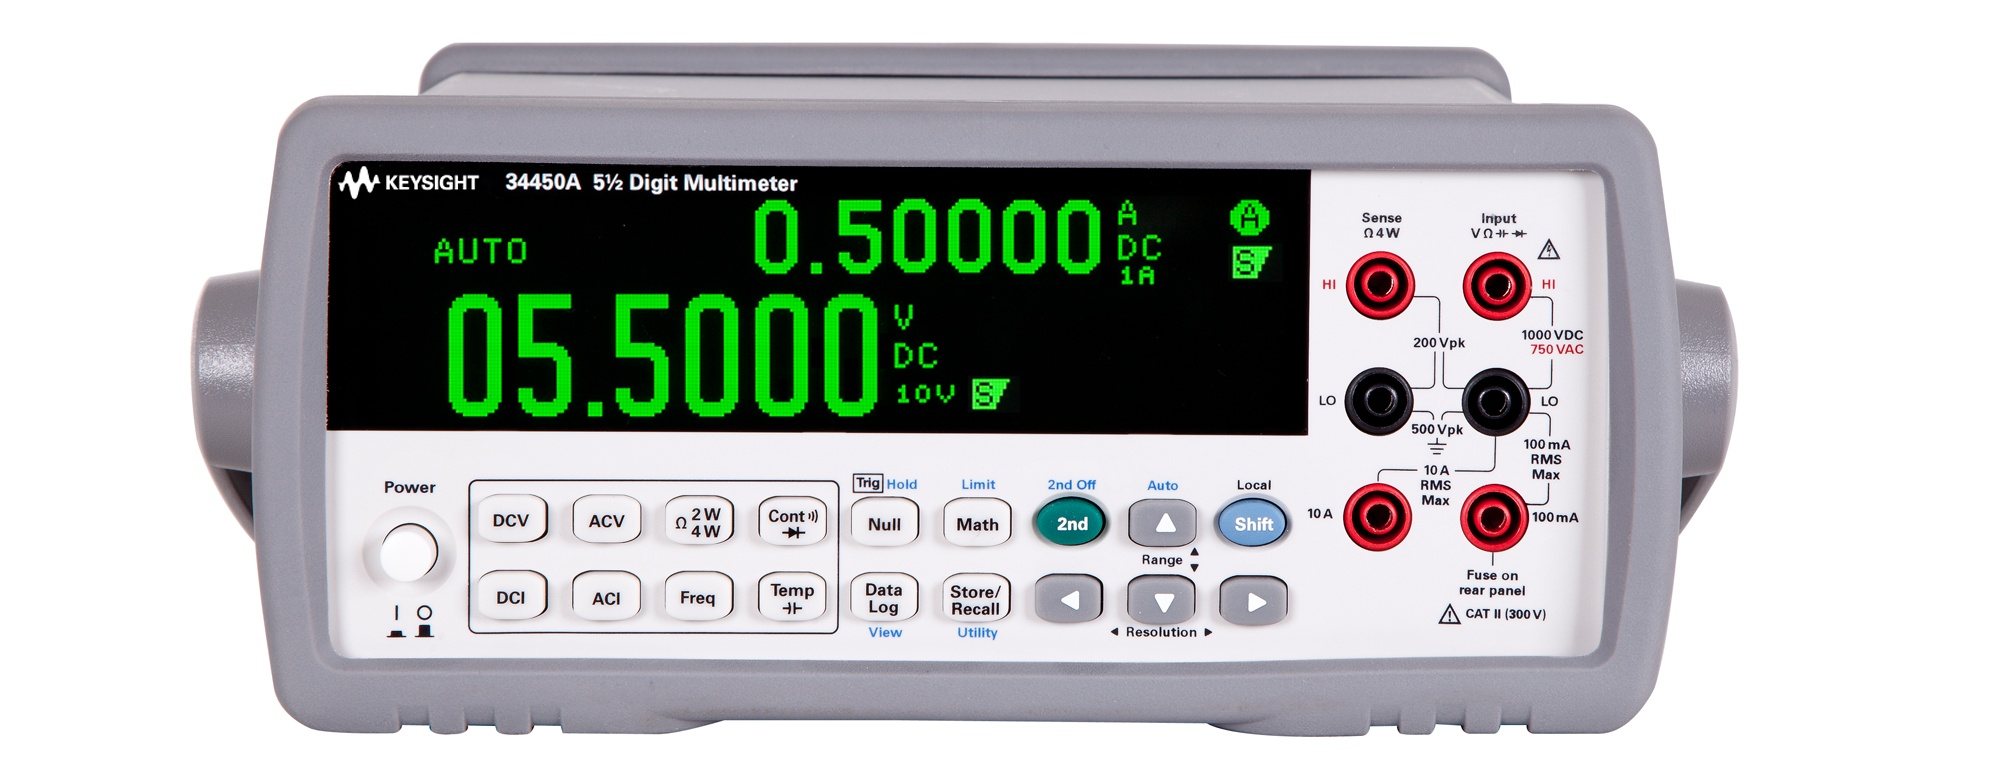 34450A Dijital Multimetre, 5 ½ Dijit